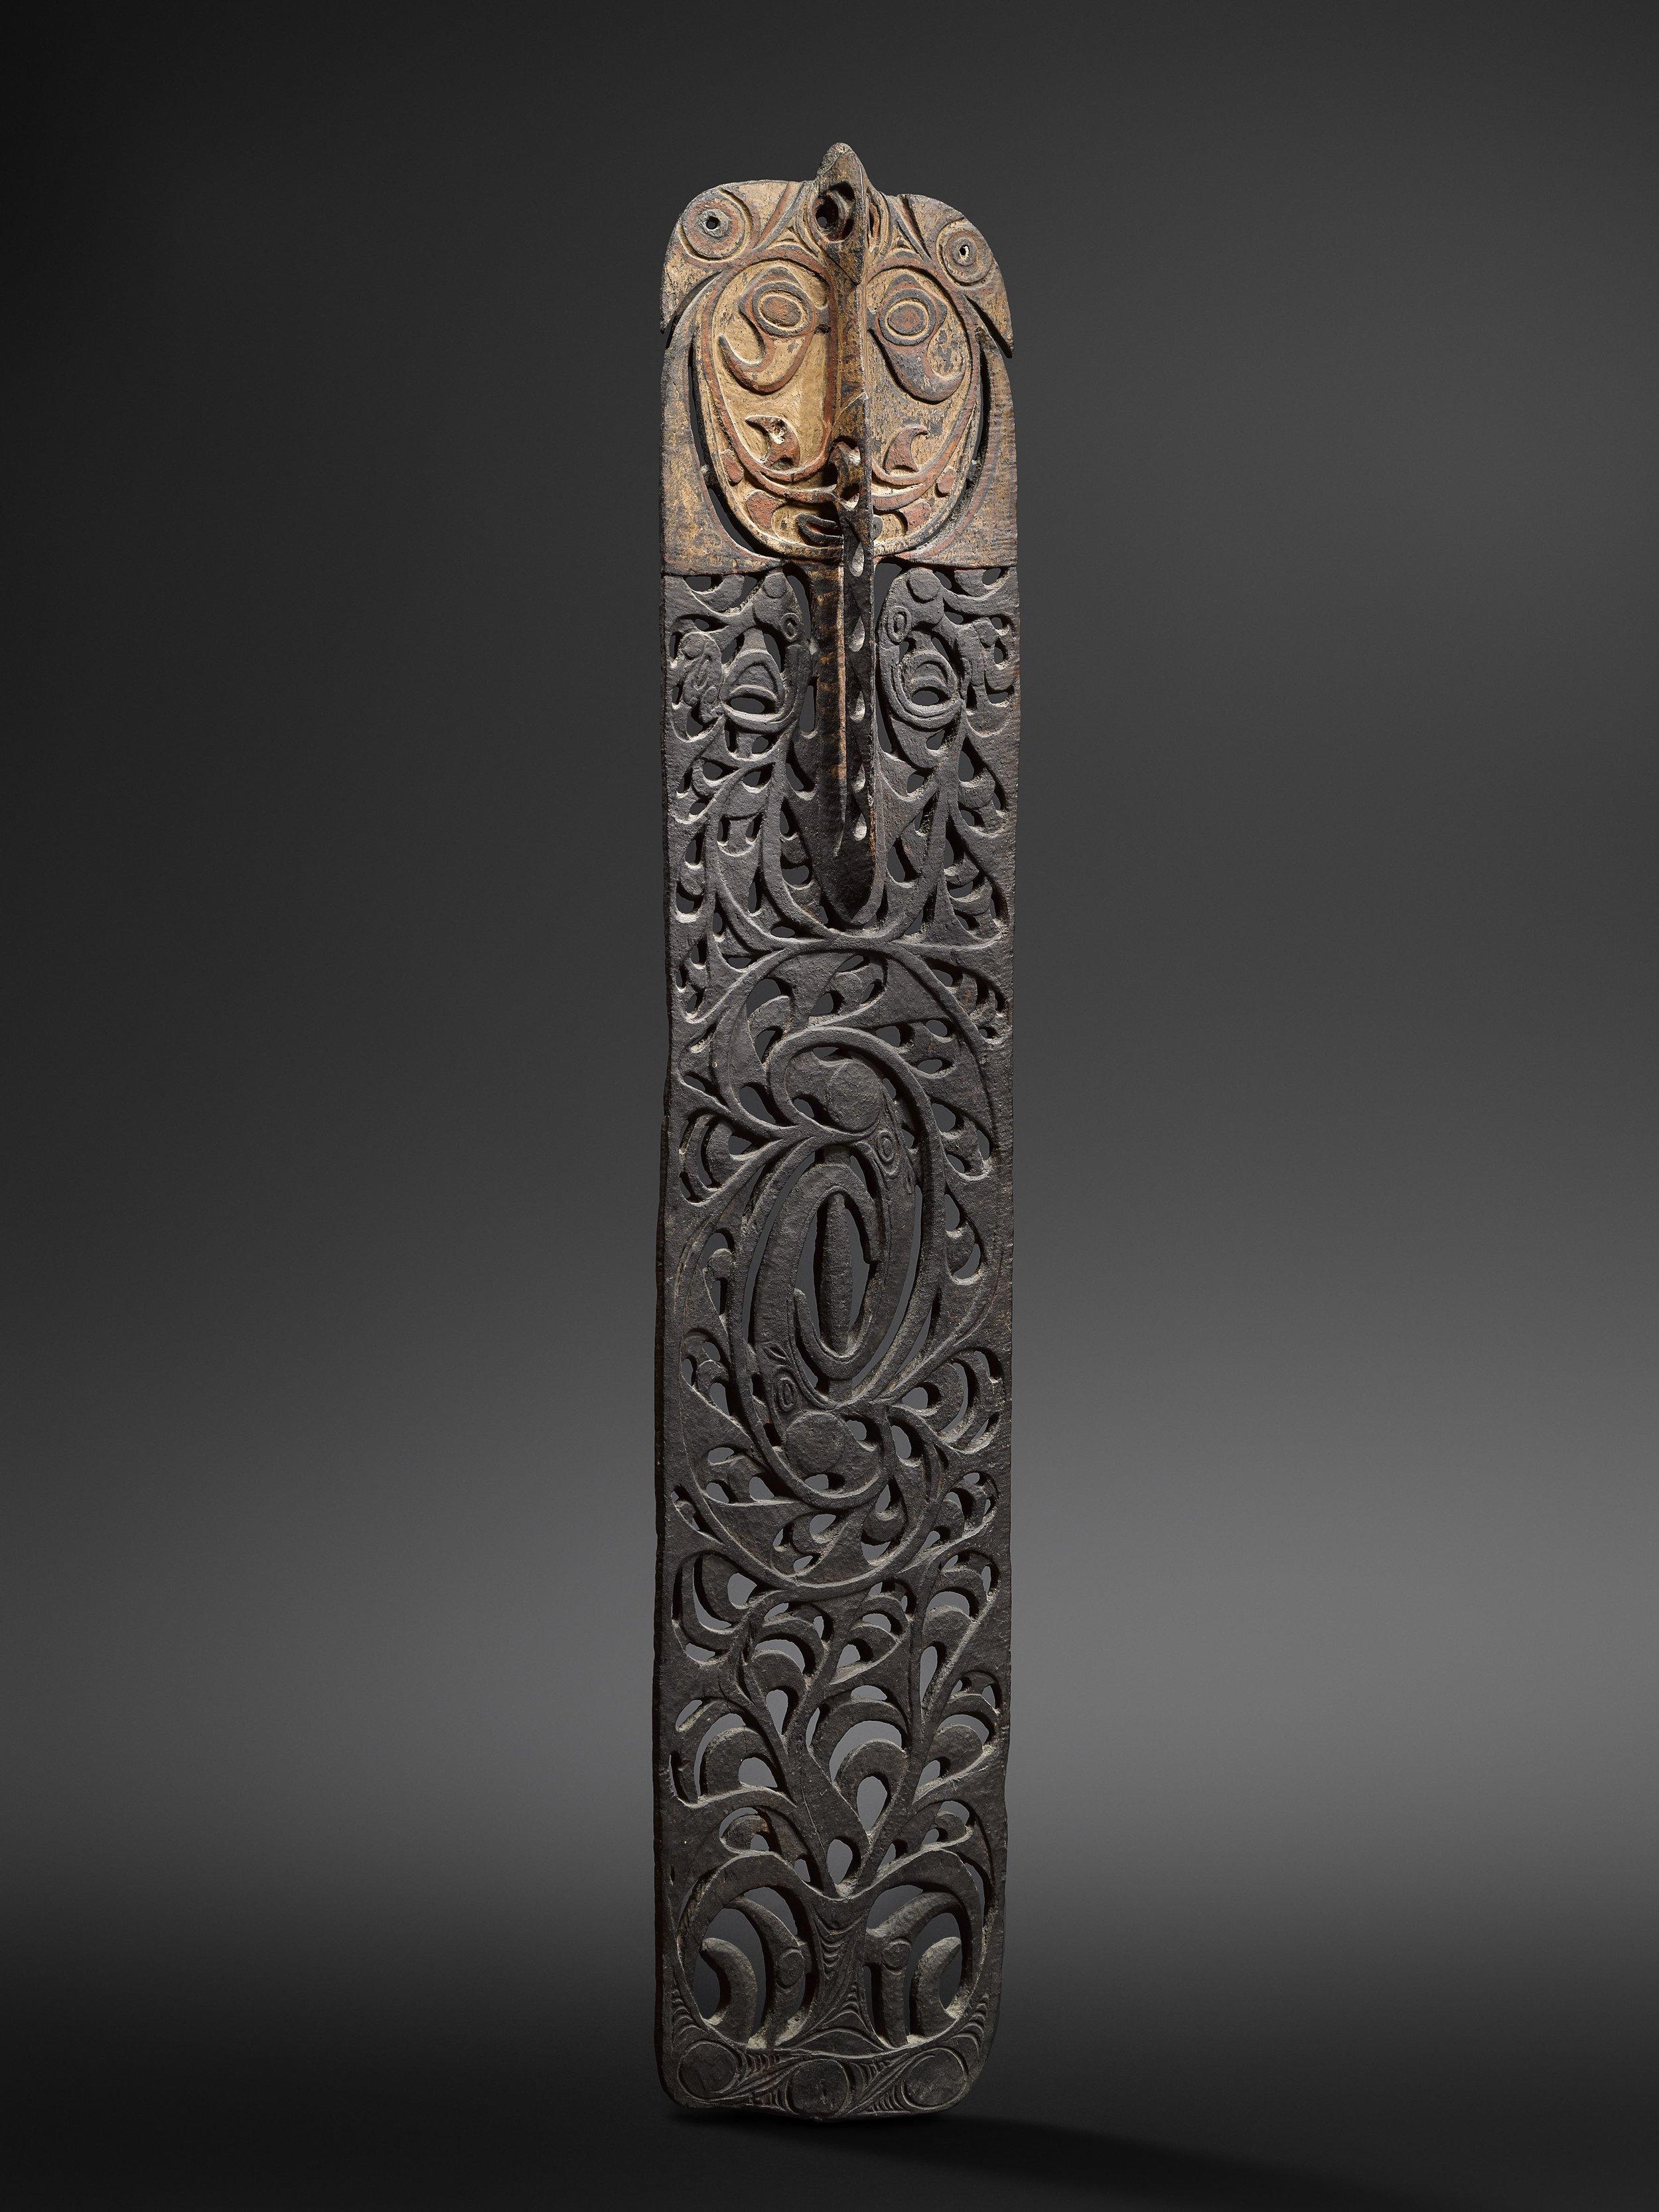 Ceremonial board,  malu.  Sawos or Iatmul. Wood and pigment. 178 cm. Alexander Kubetz, Munich. © Hugues Dubois, Brussels/Paris